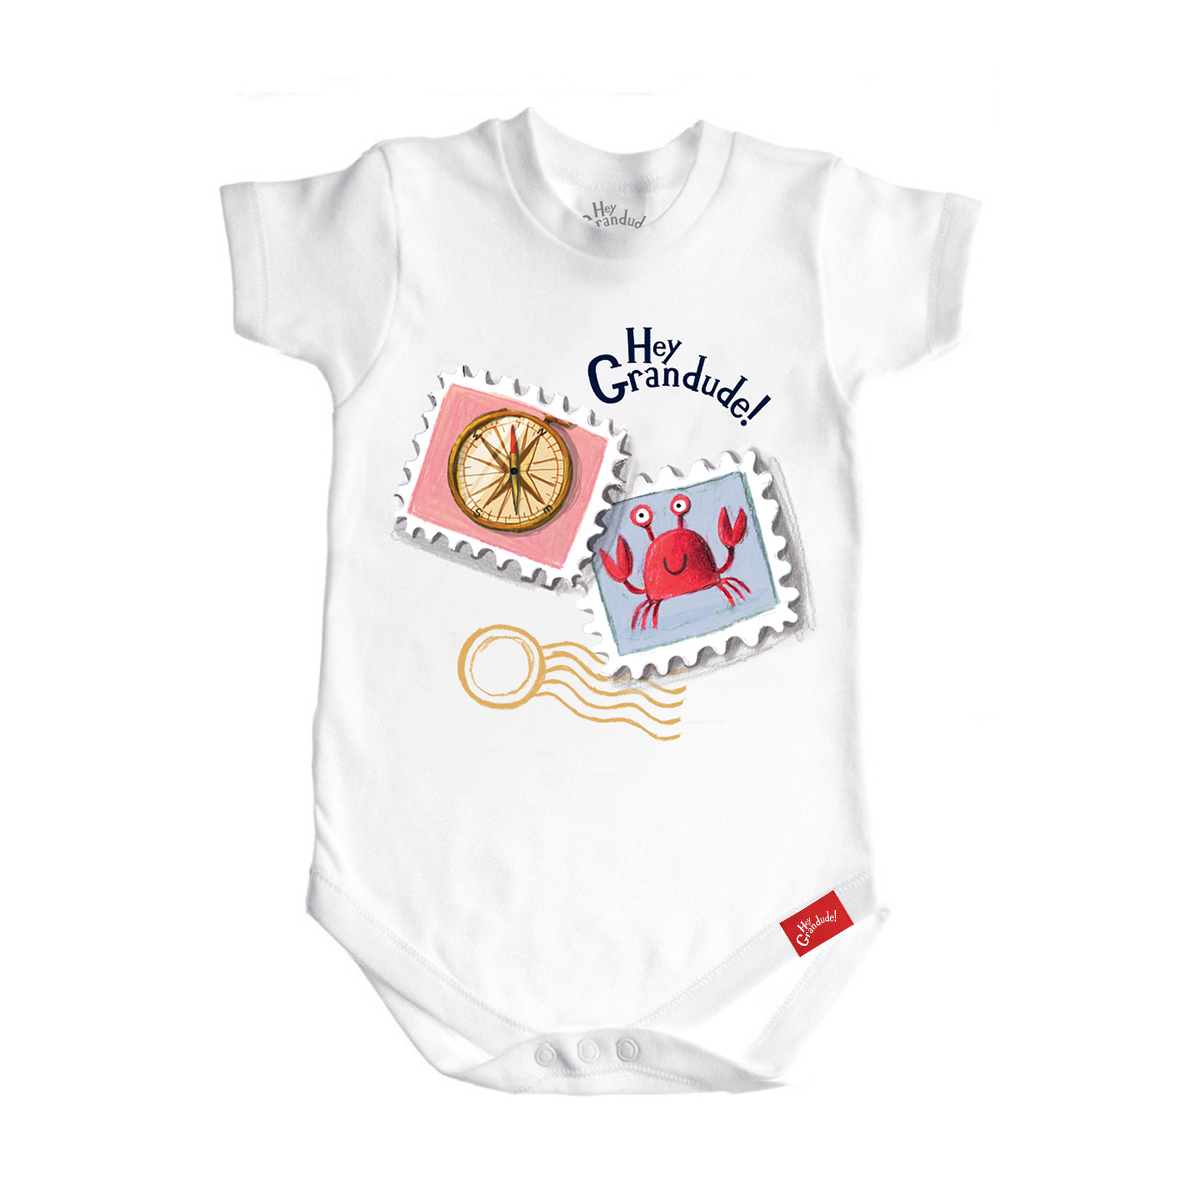 Hey Grandude! Infant Onesie